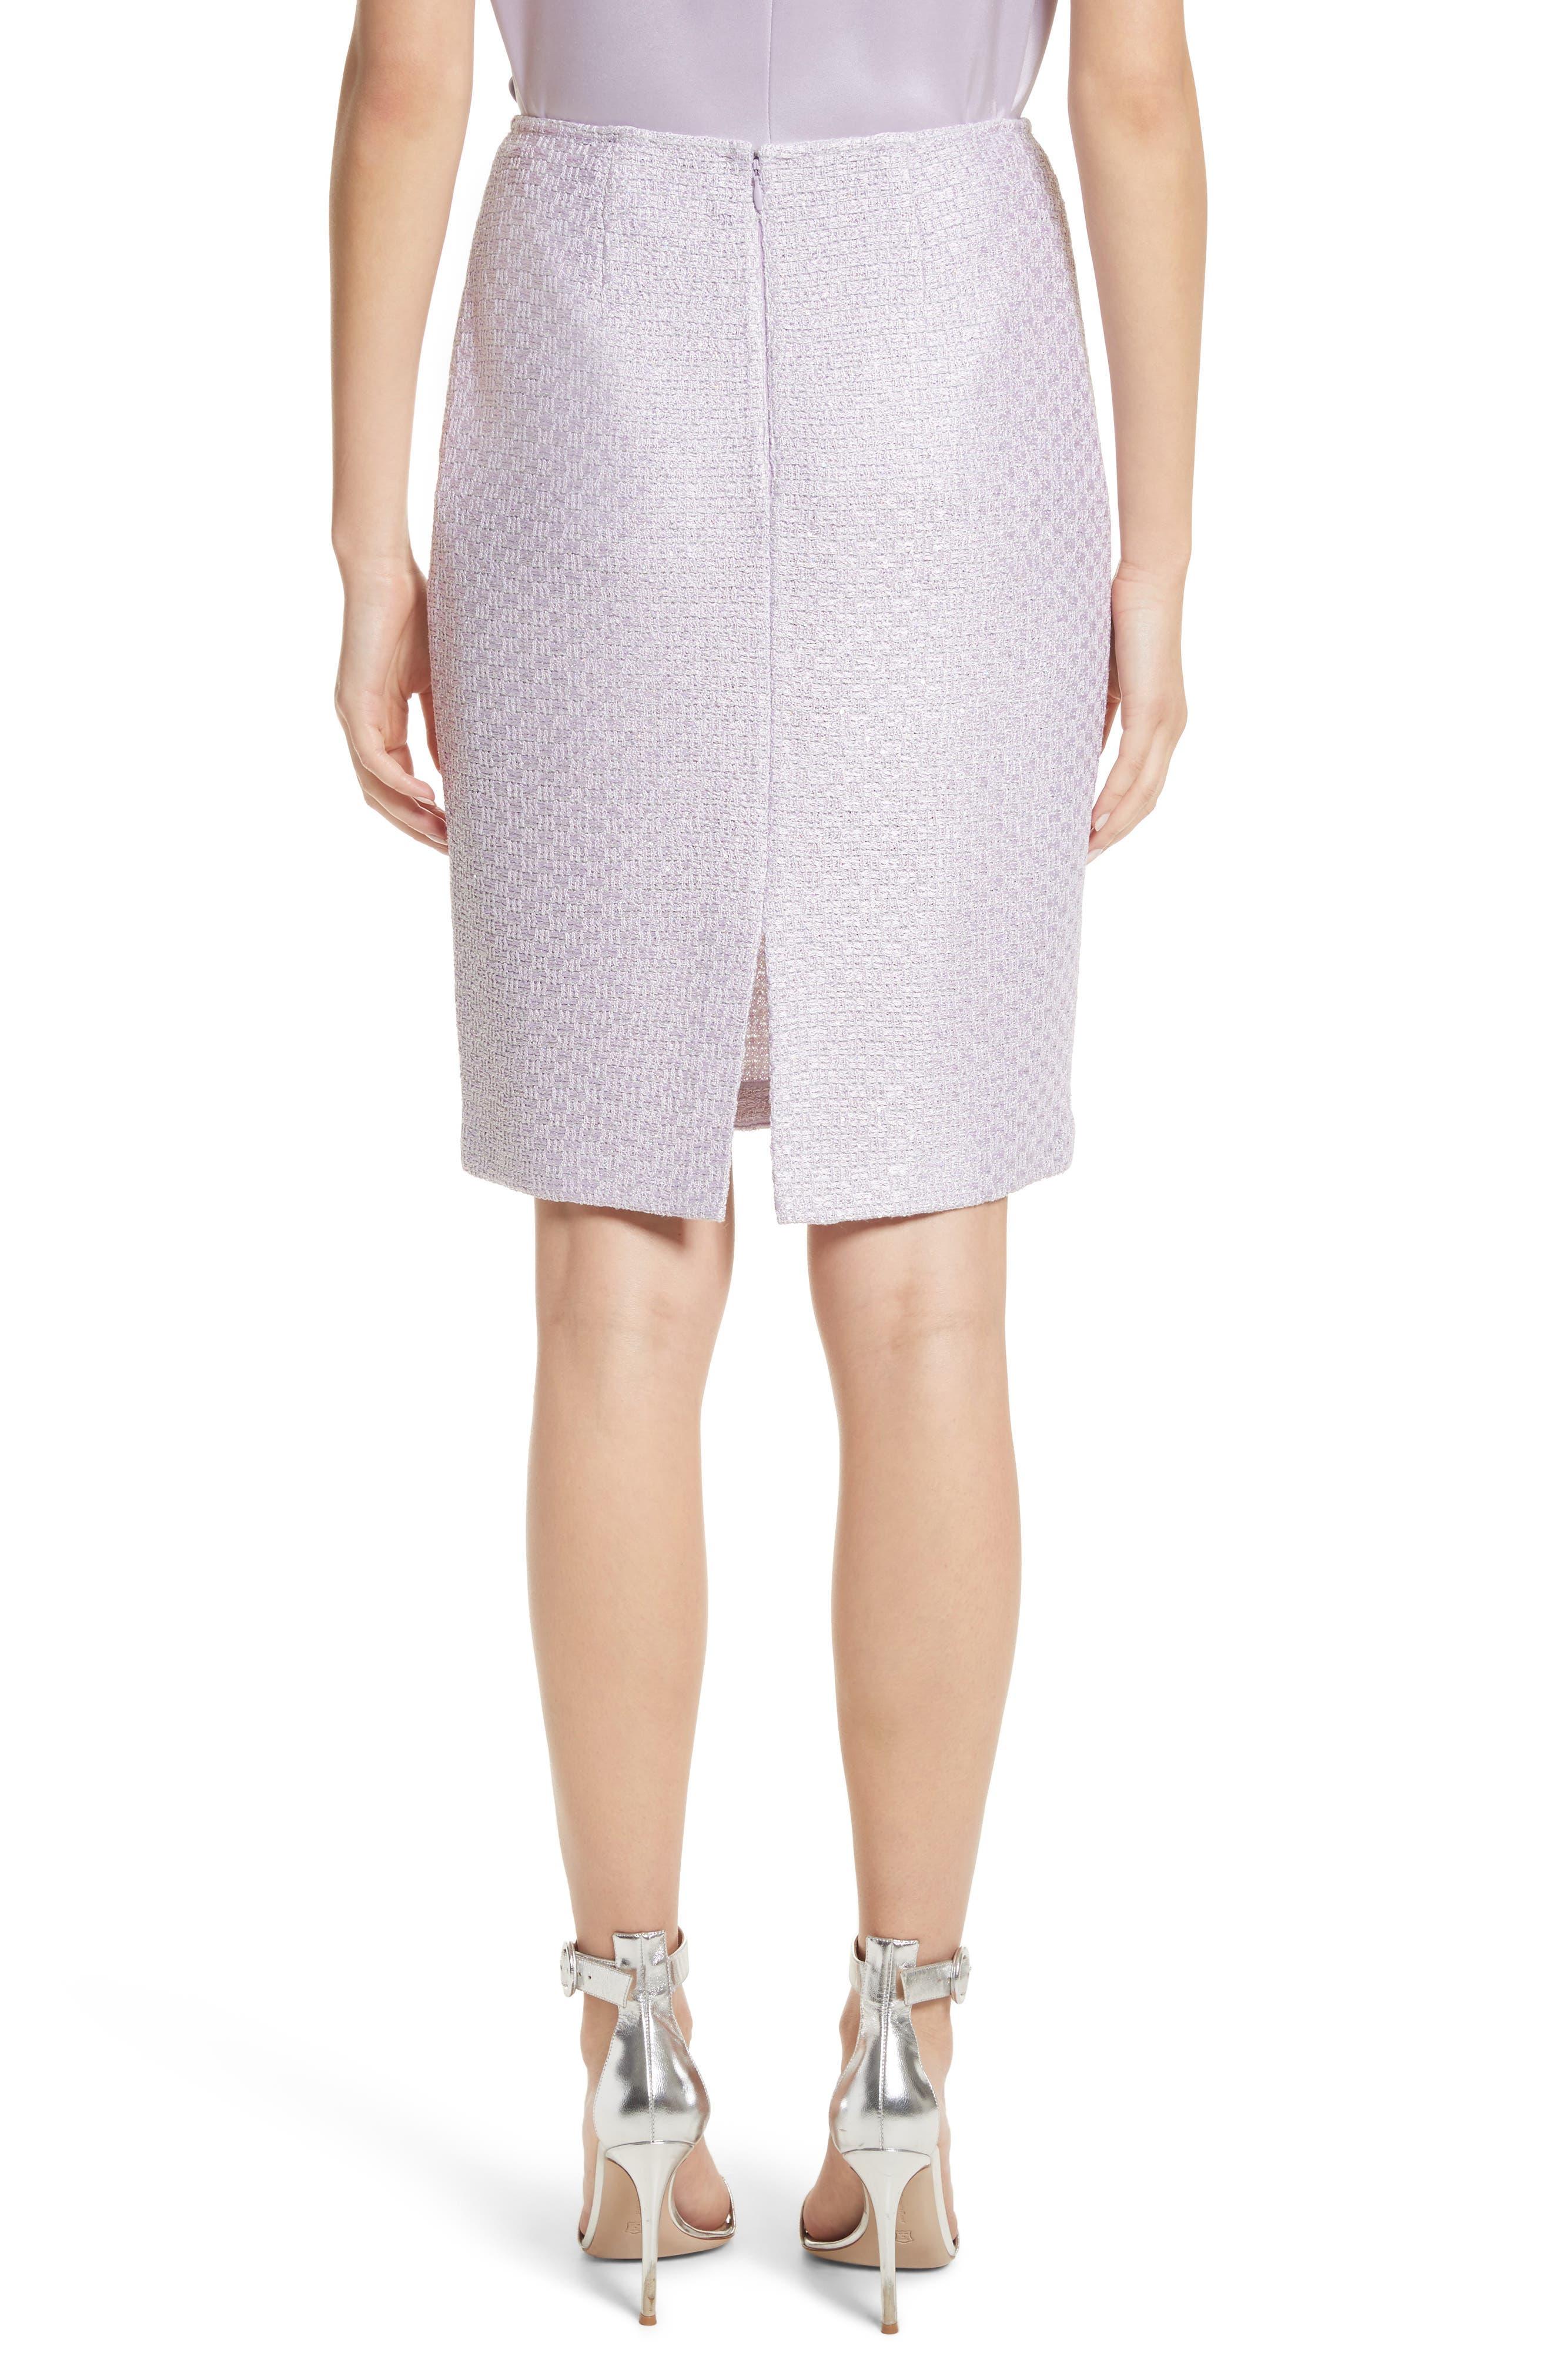 Hansh Sequin Knit Pencil Skirt,                             Alternate thumbnail 2, color,                             Lilac Multi